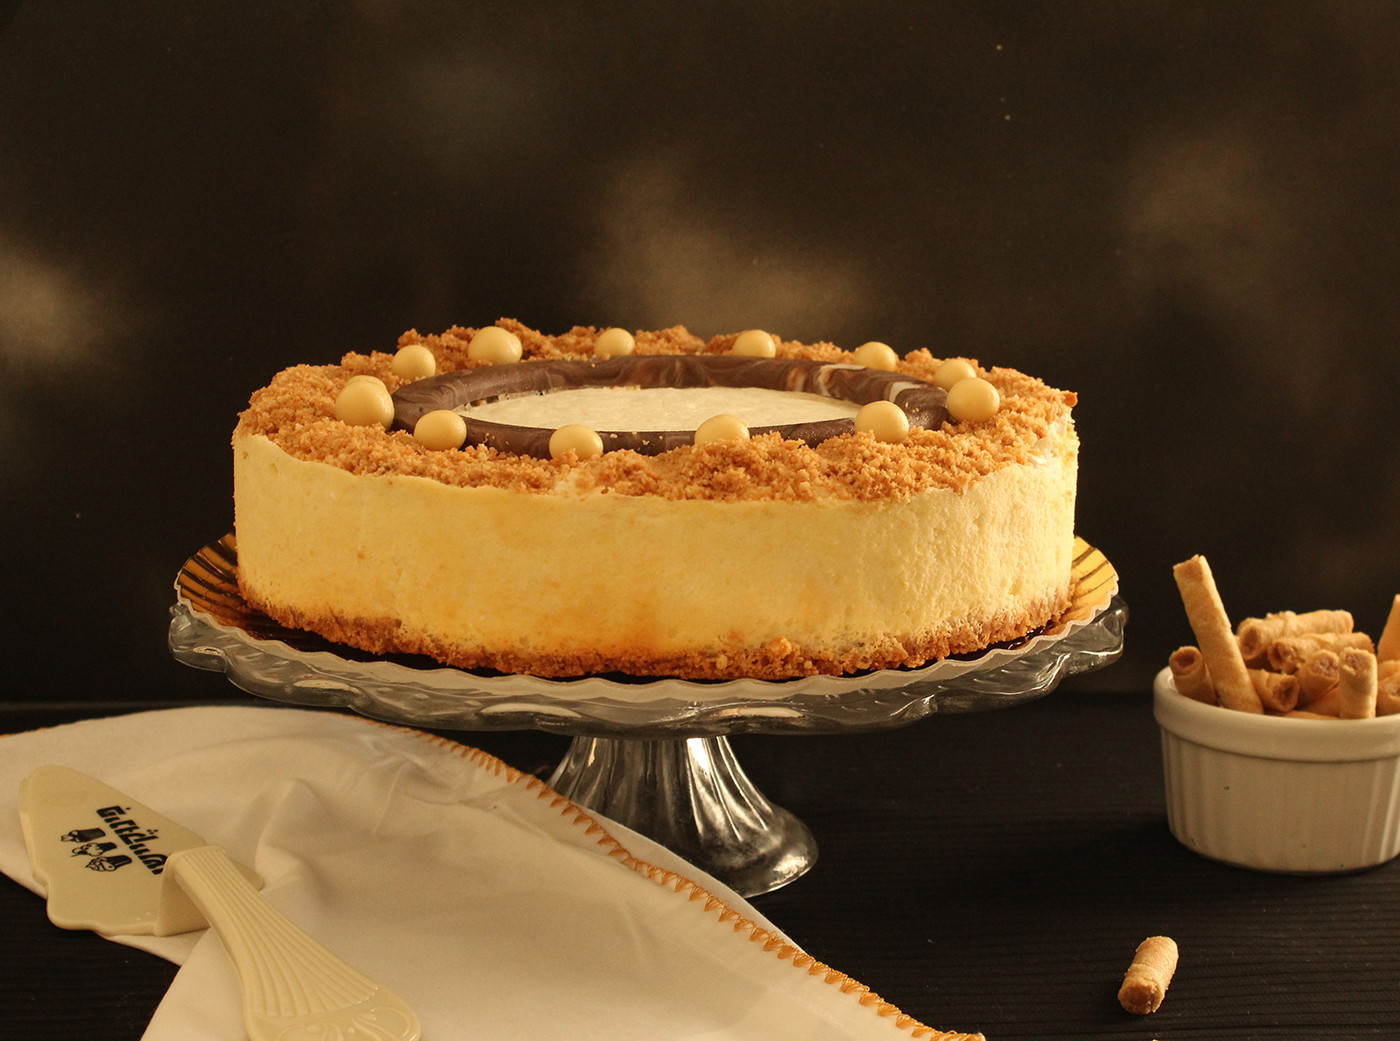 IMG 8278 - עוגת גבינה גבוהה וטעימה